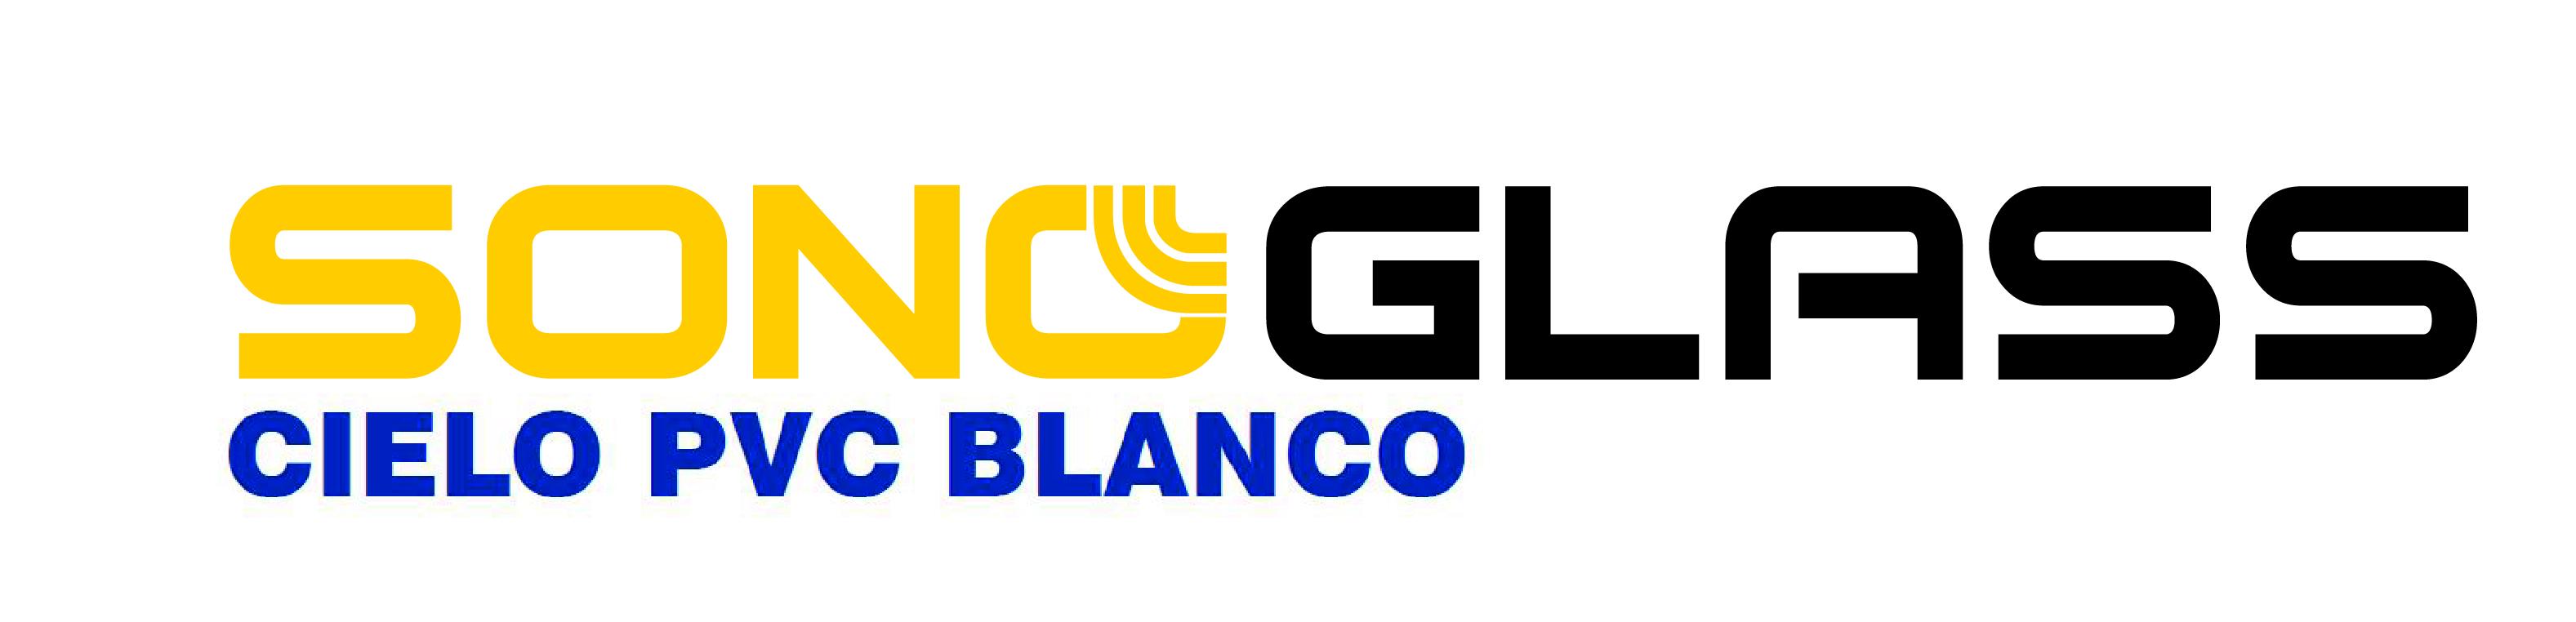 logotipo sonoglass pvc blanco